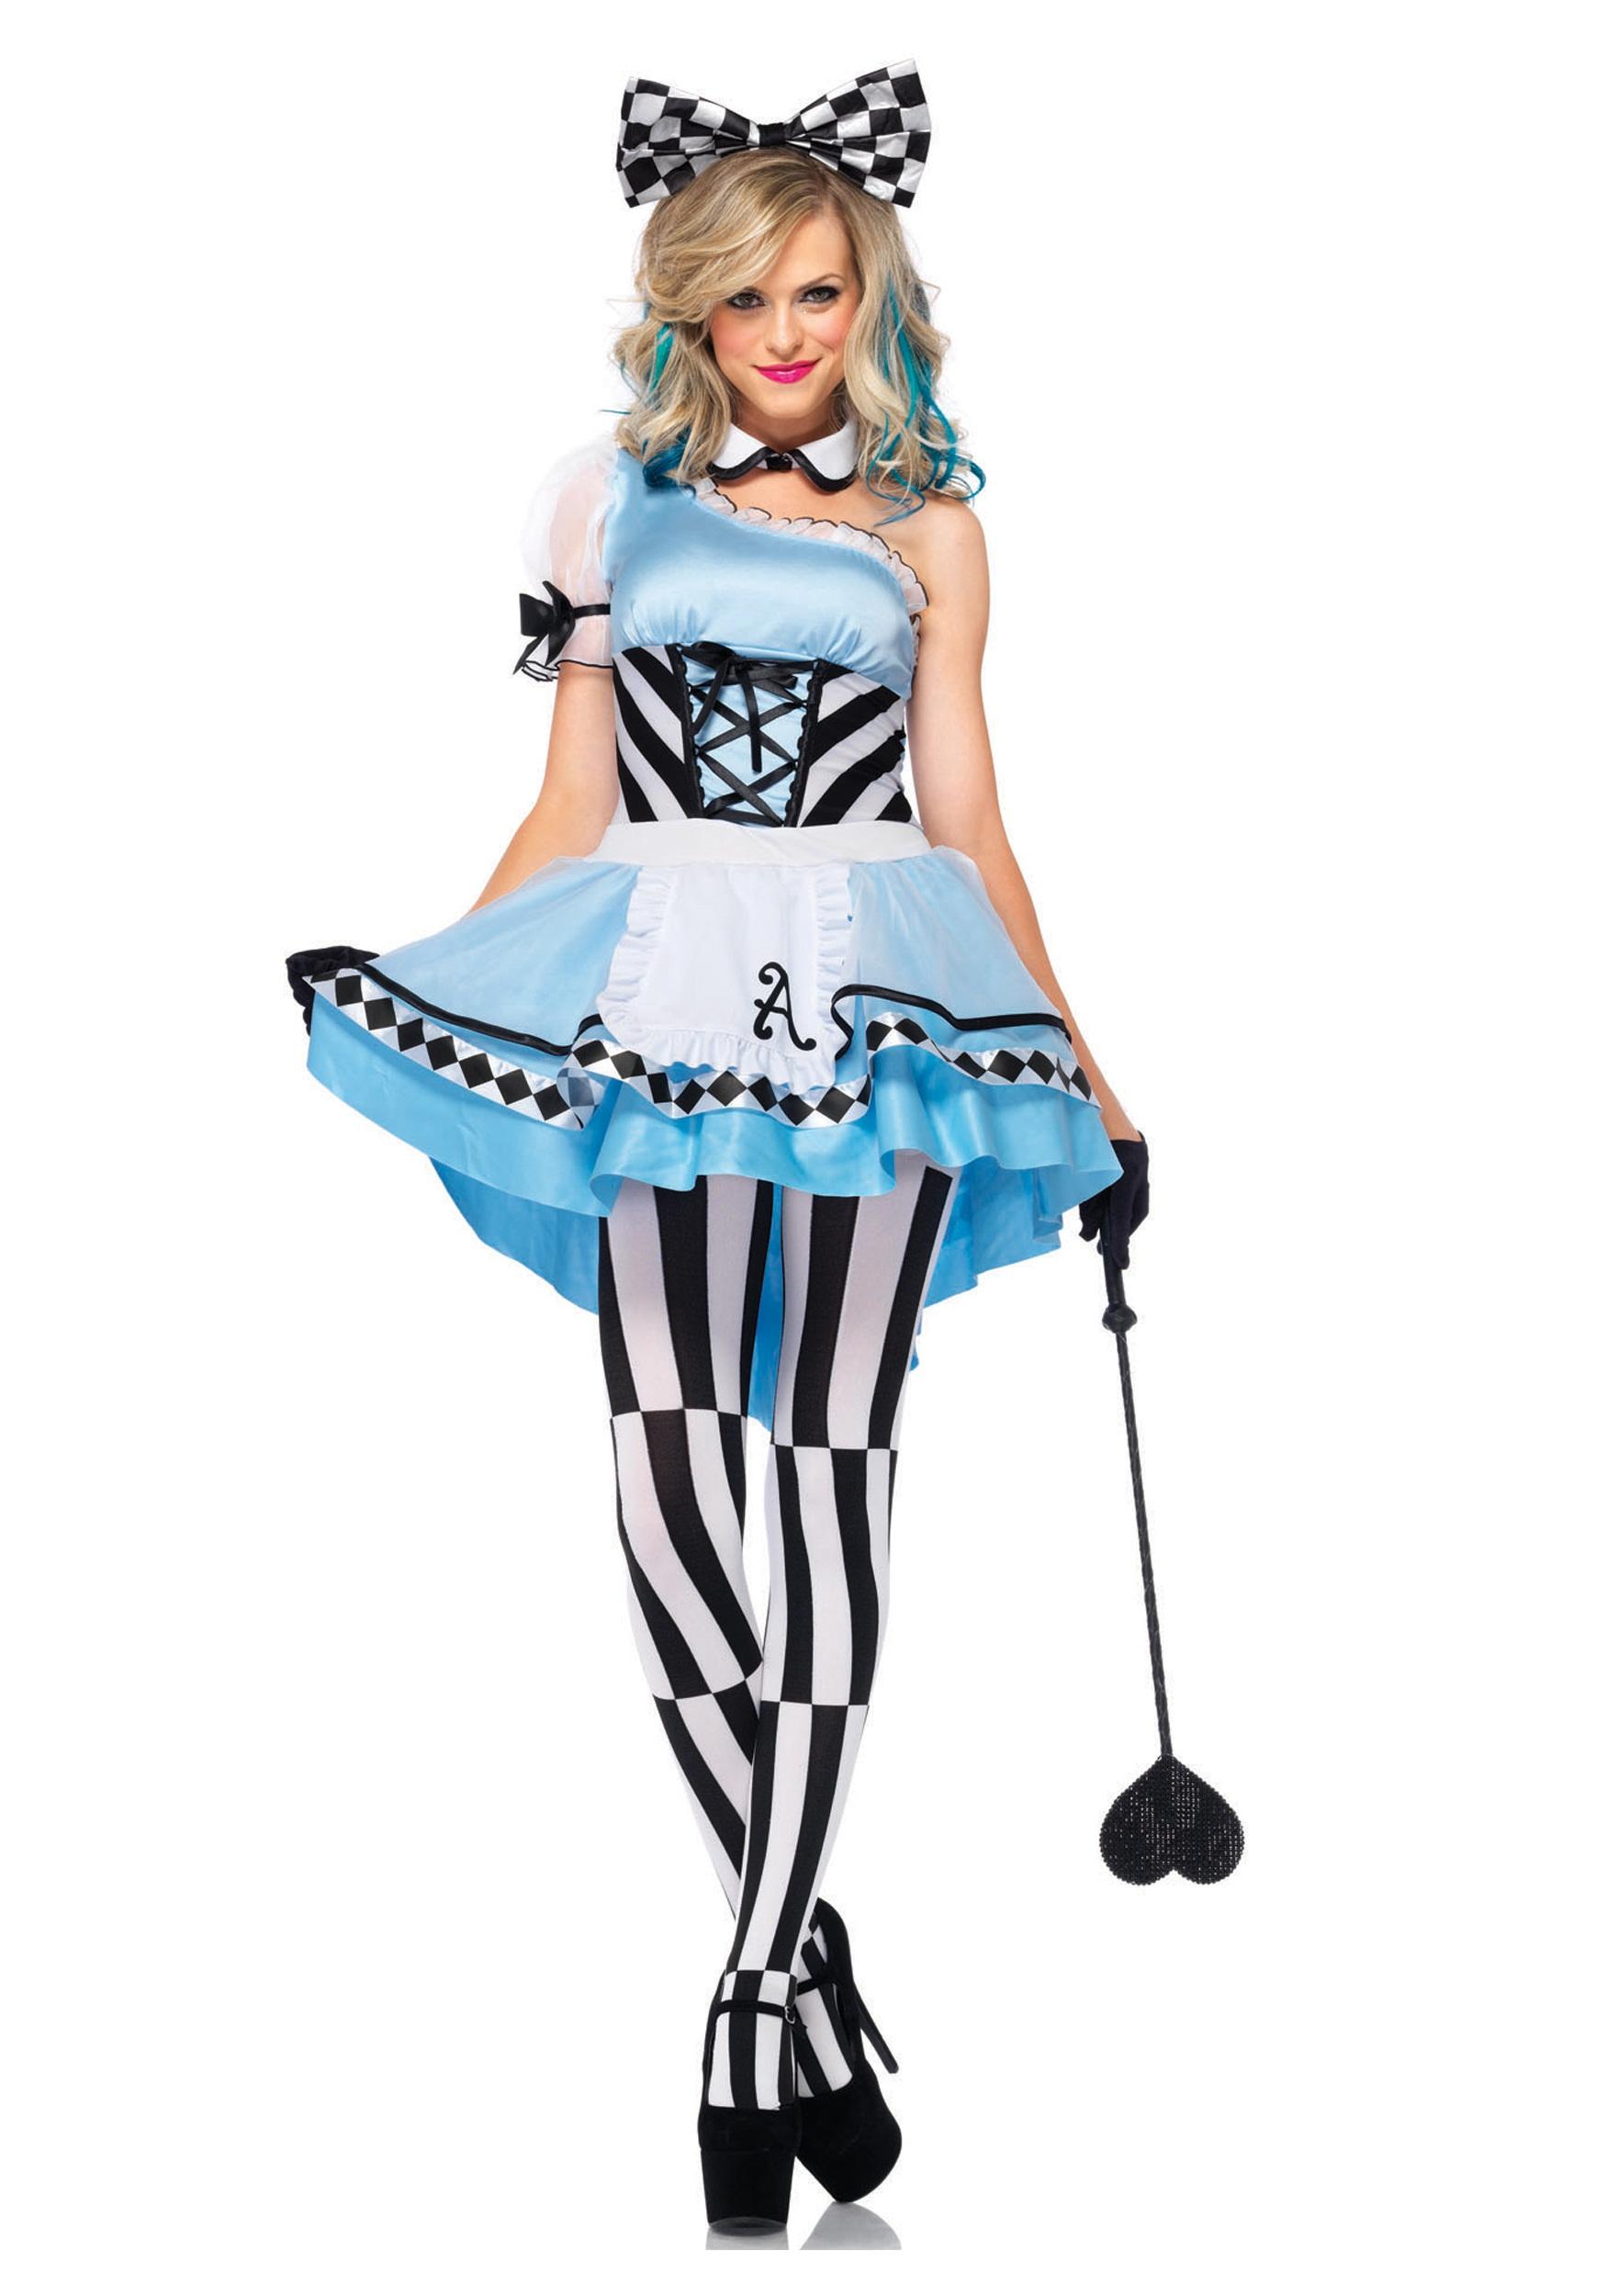 Psychedelic Alice in Wonderland Psychedelic Alice Costume